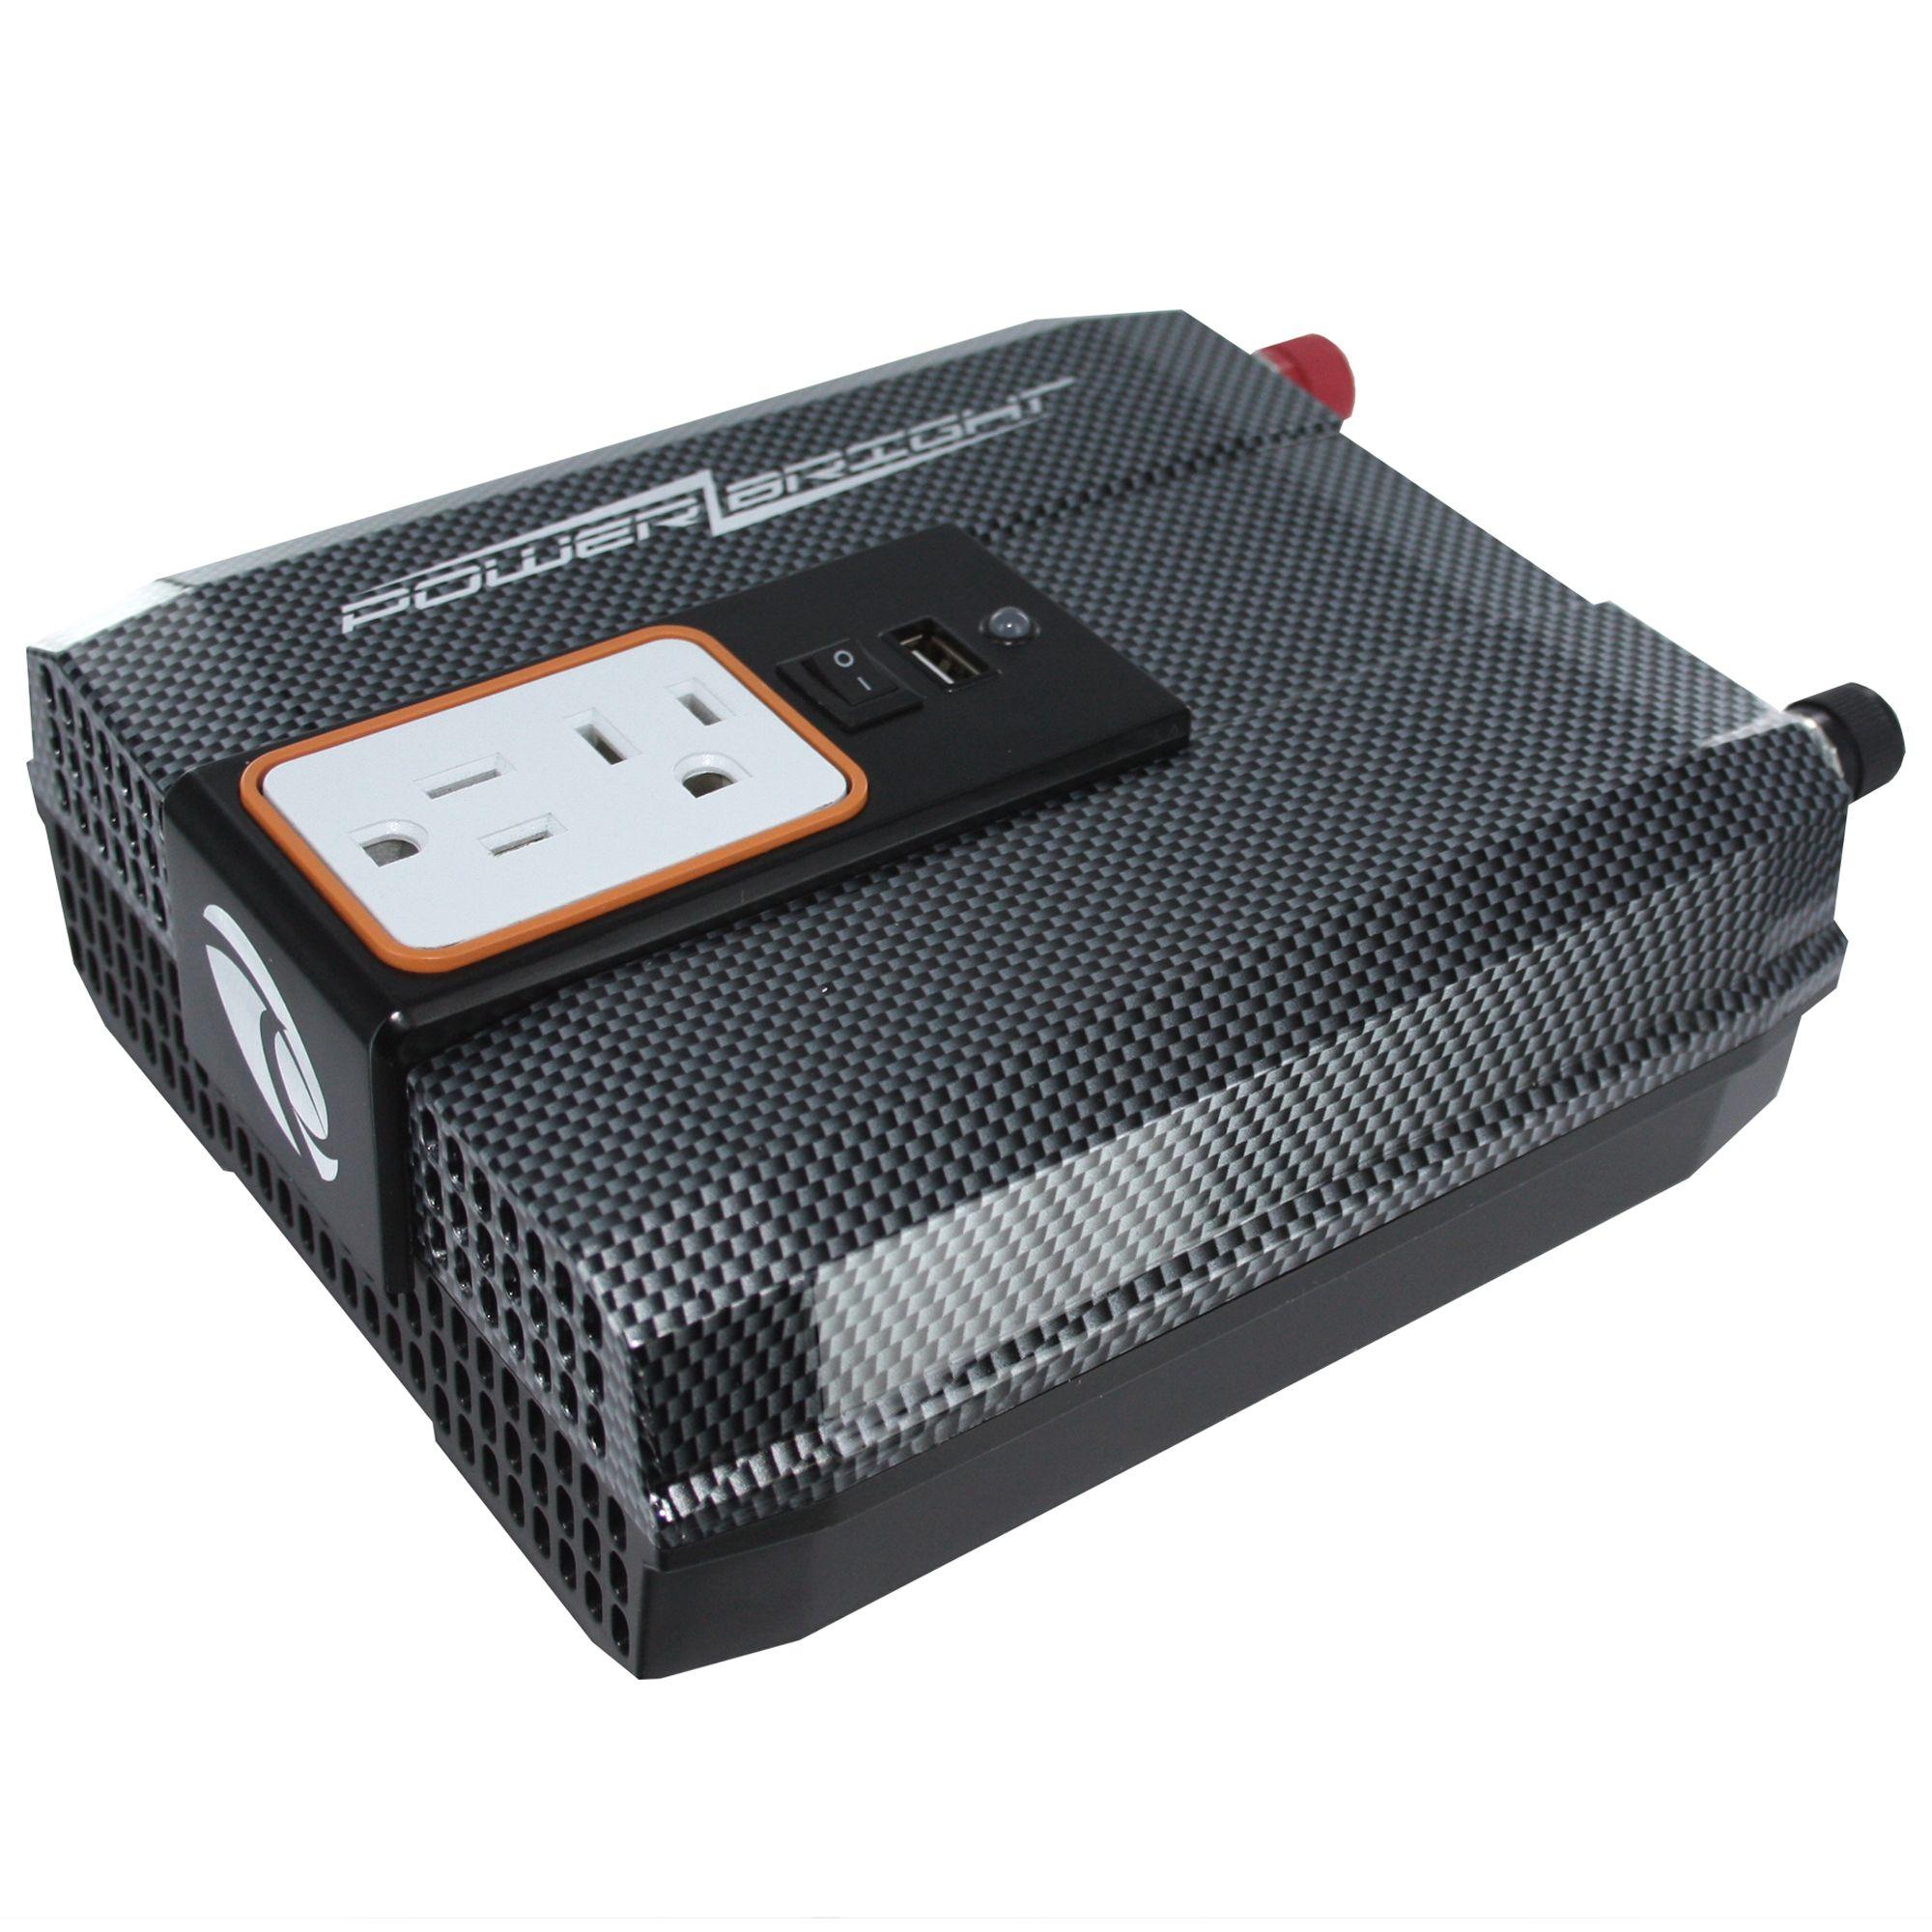 Power Bright Inverter 750 Watt 12v Dc 110v Ac With Usb - Automotive Batteries